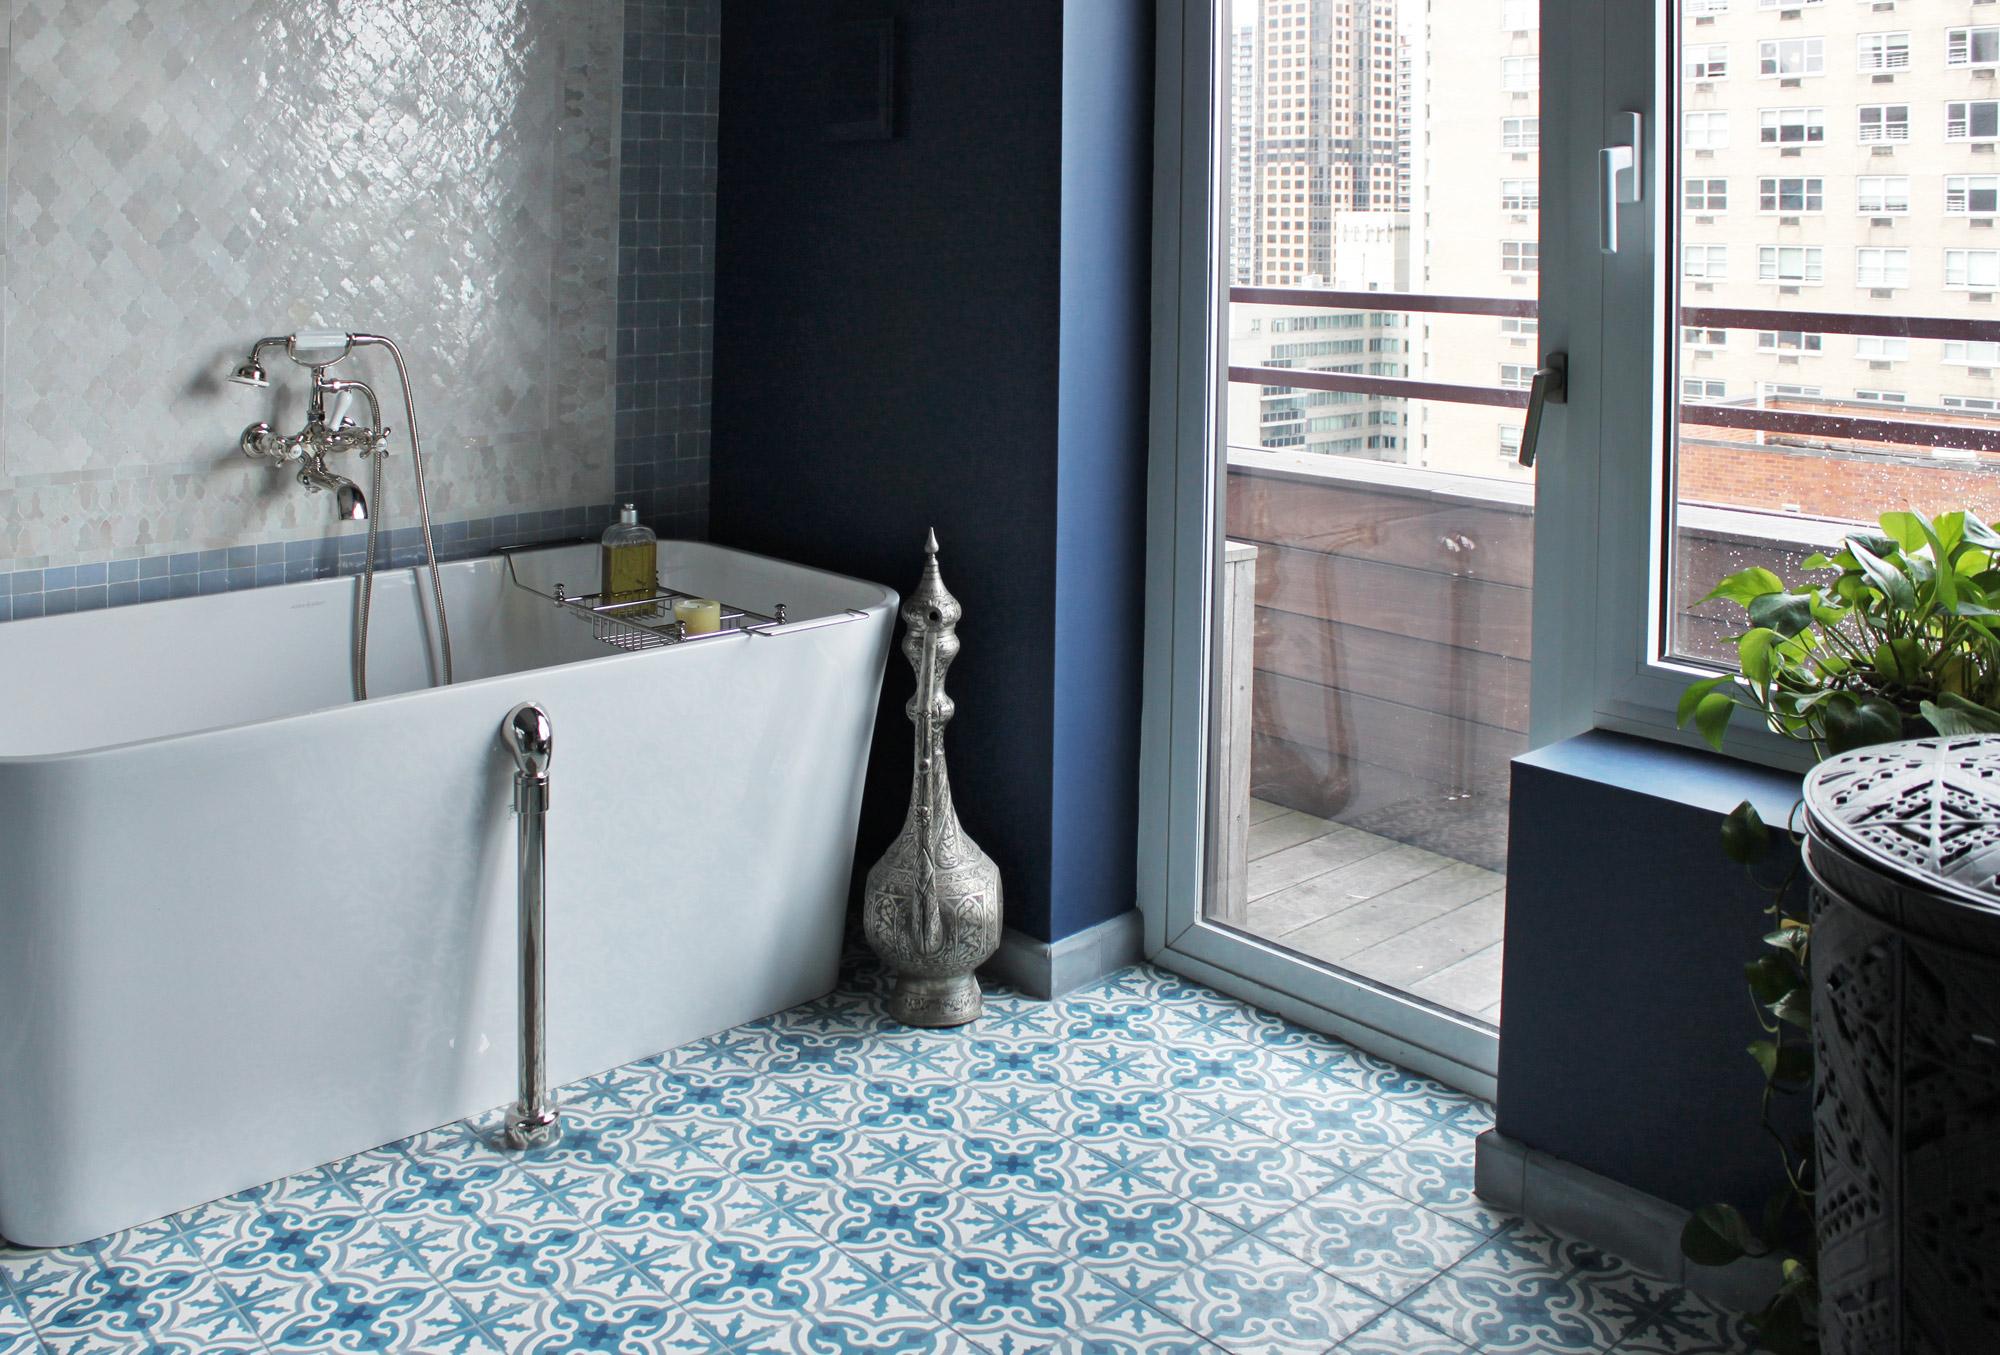 Patterned Bathroom Tile Floors  Busy or Beautiful